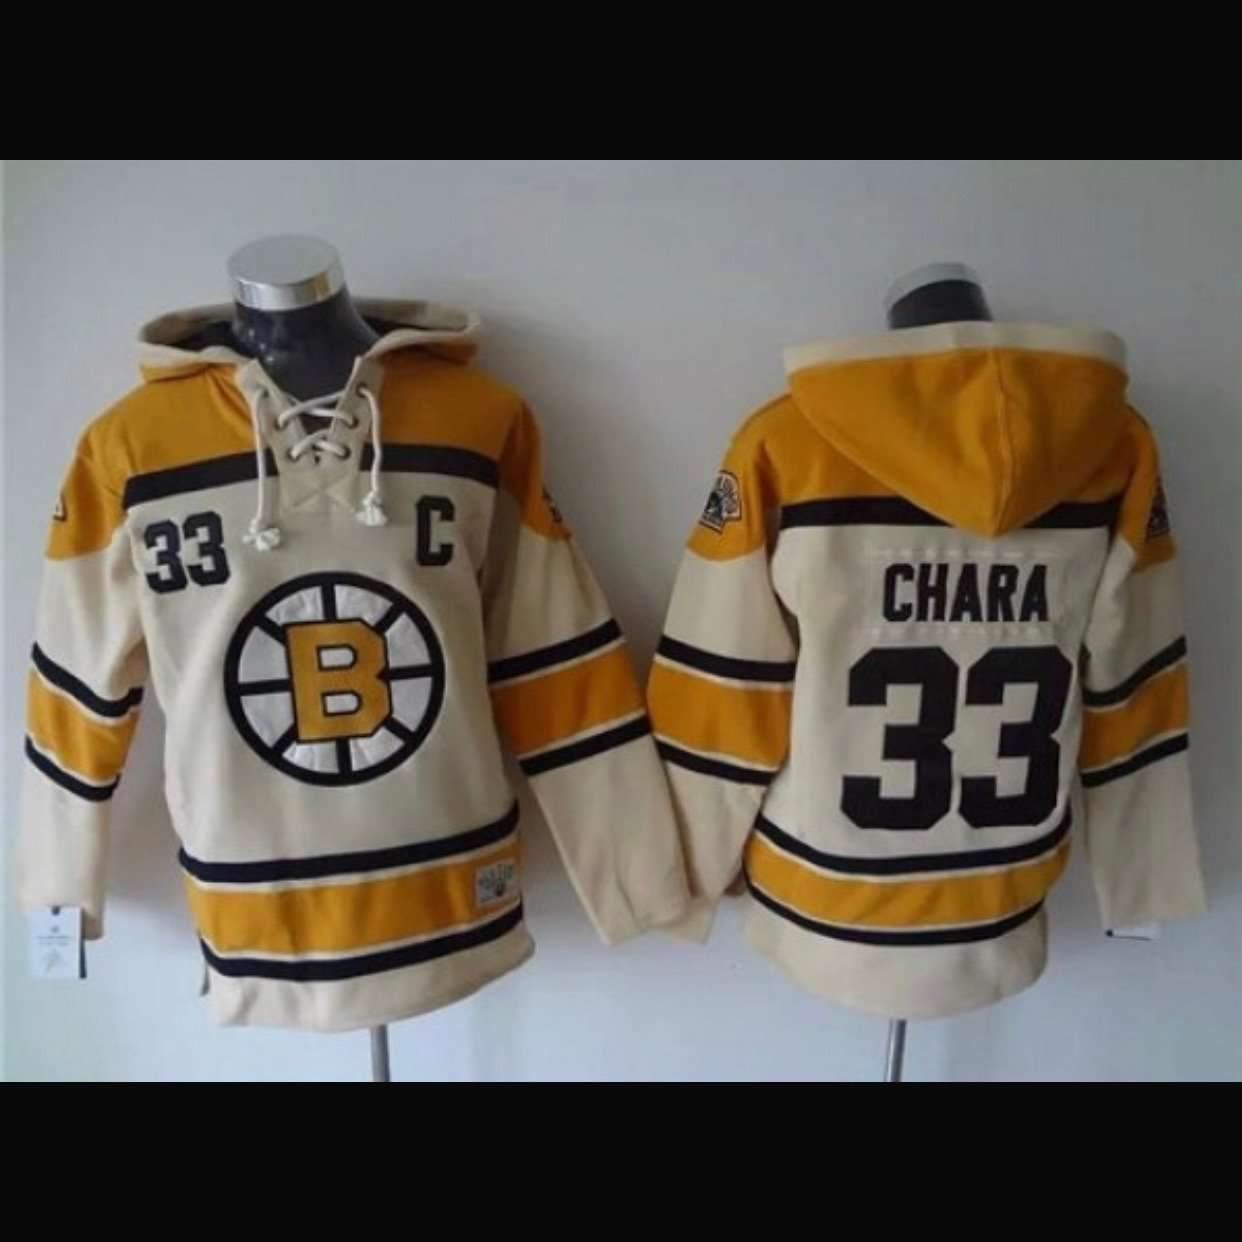 Boston Bruins NHL Hockey Team Apparel Hoodies Products